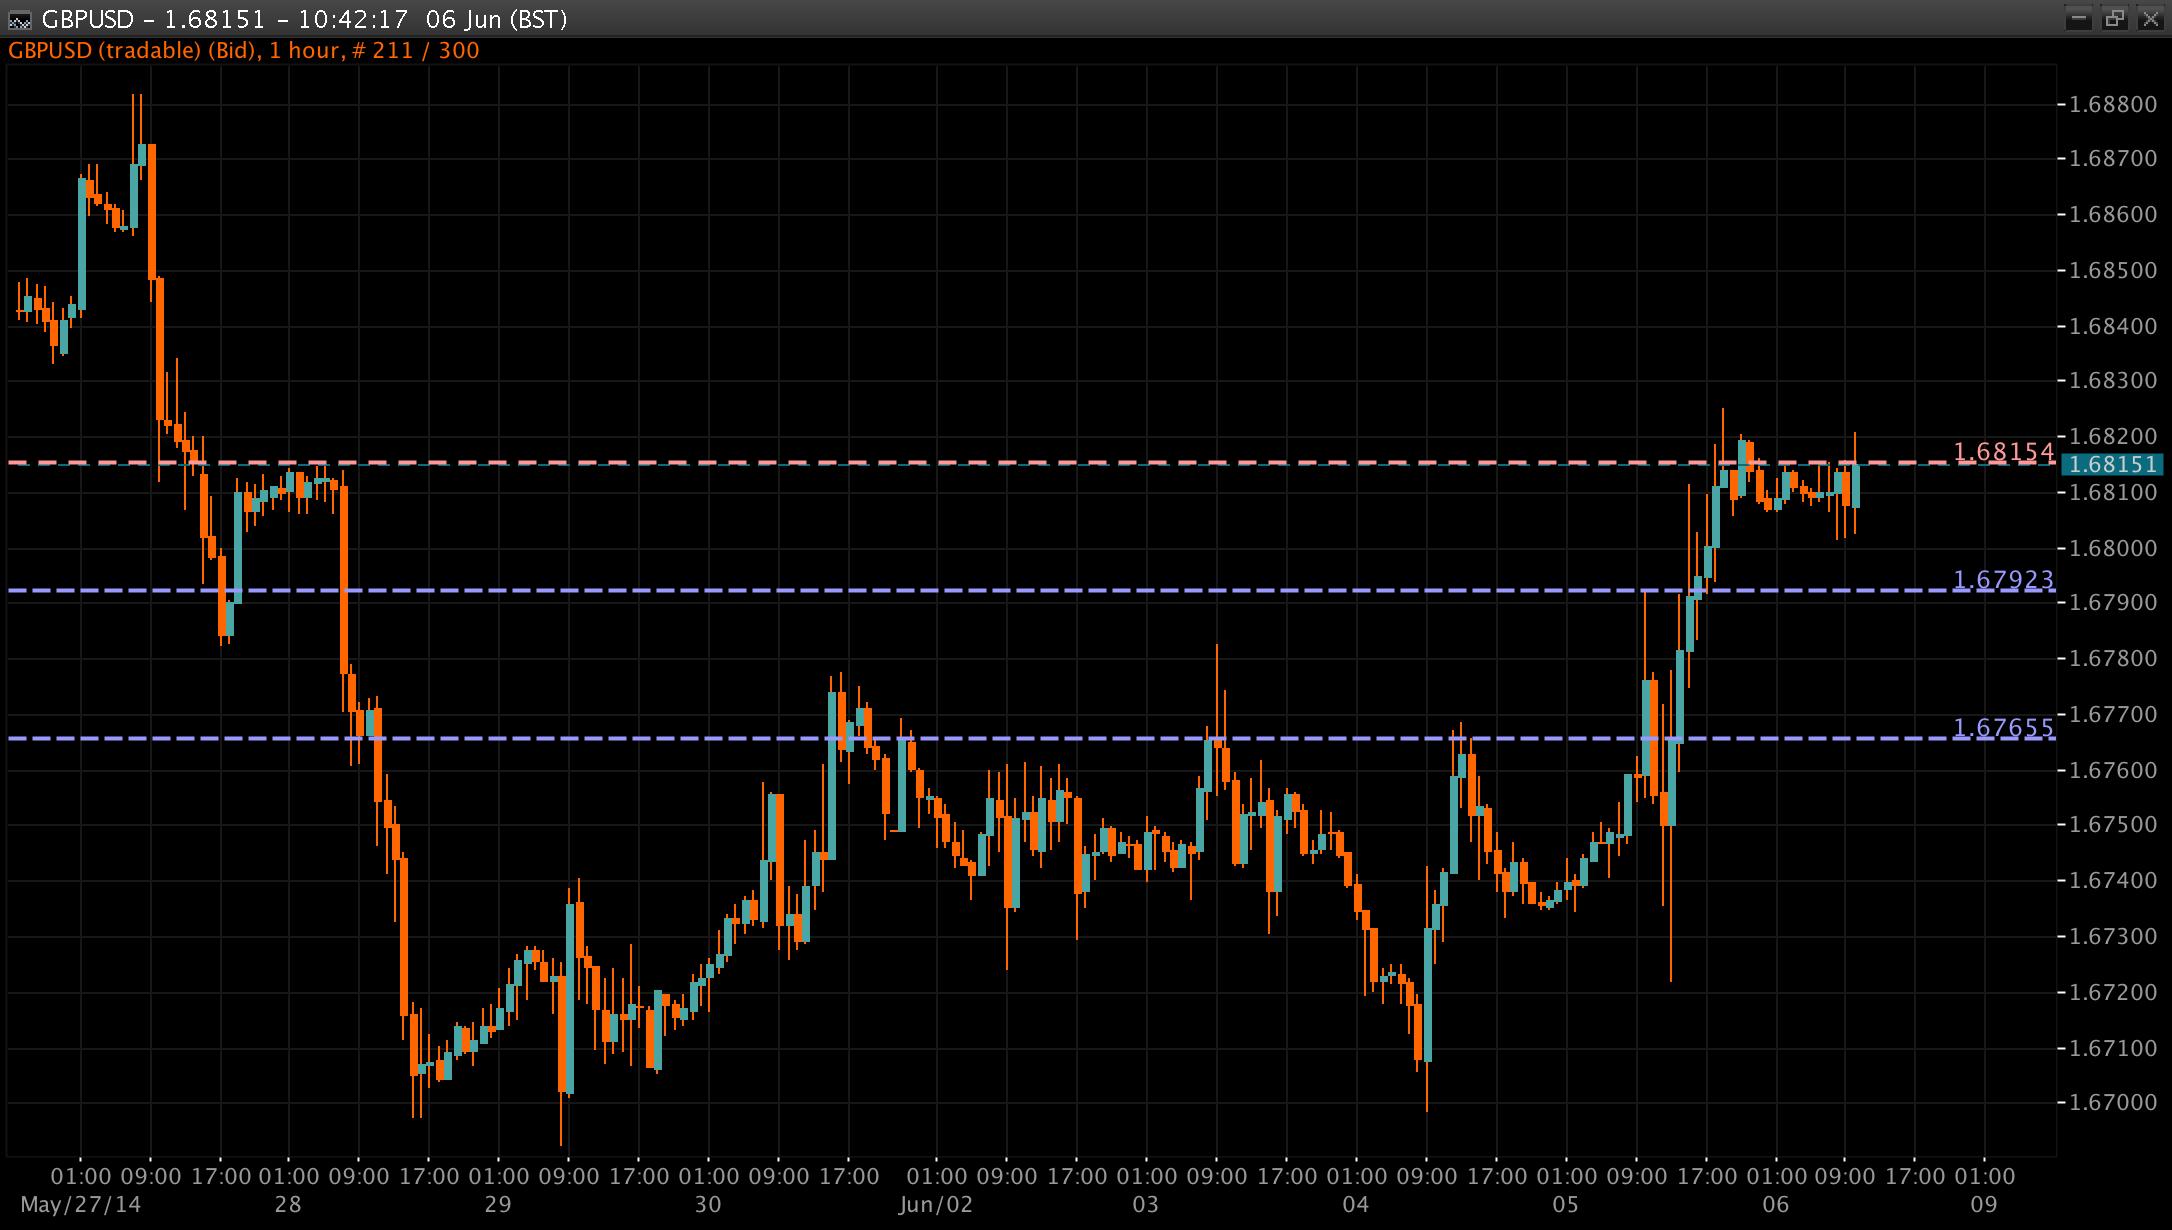 GBP/USD Chart 06 June 2014